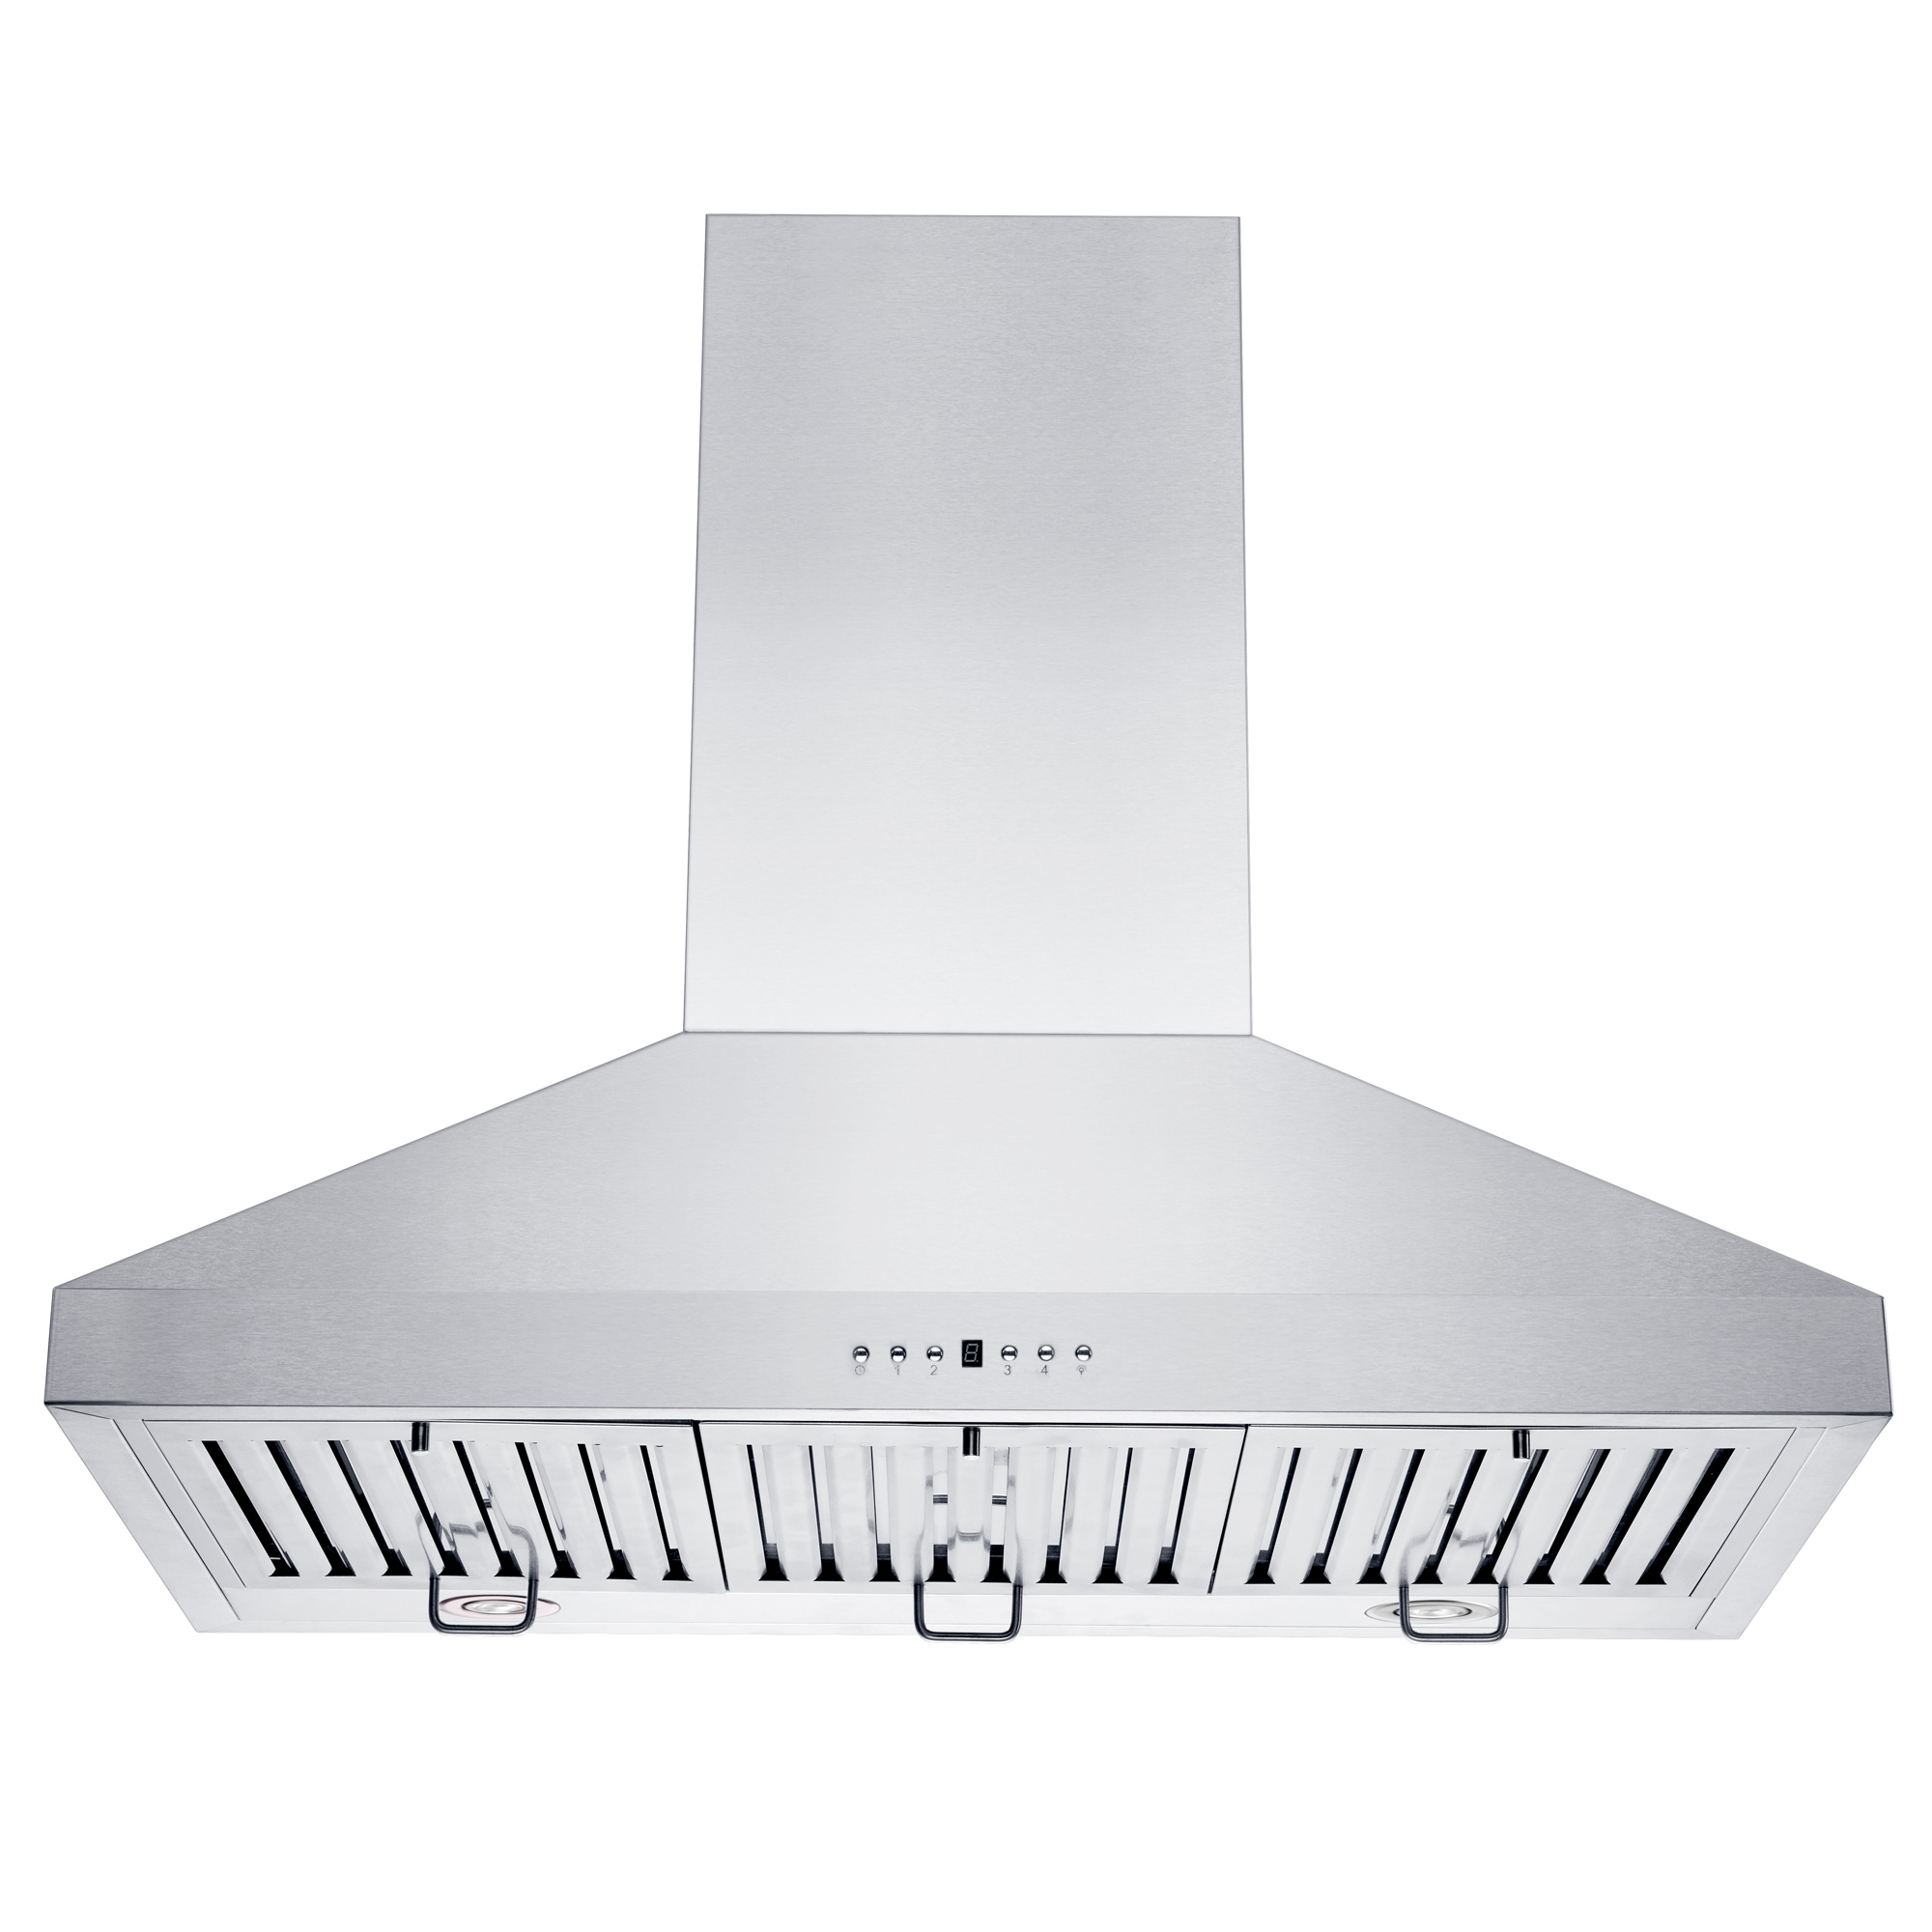 zline-stainless-steel-wall-mounted-range-hood-KL3-new-under.jpg